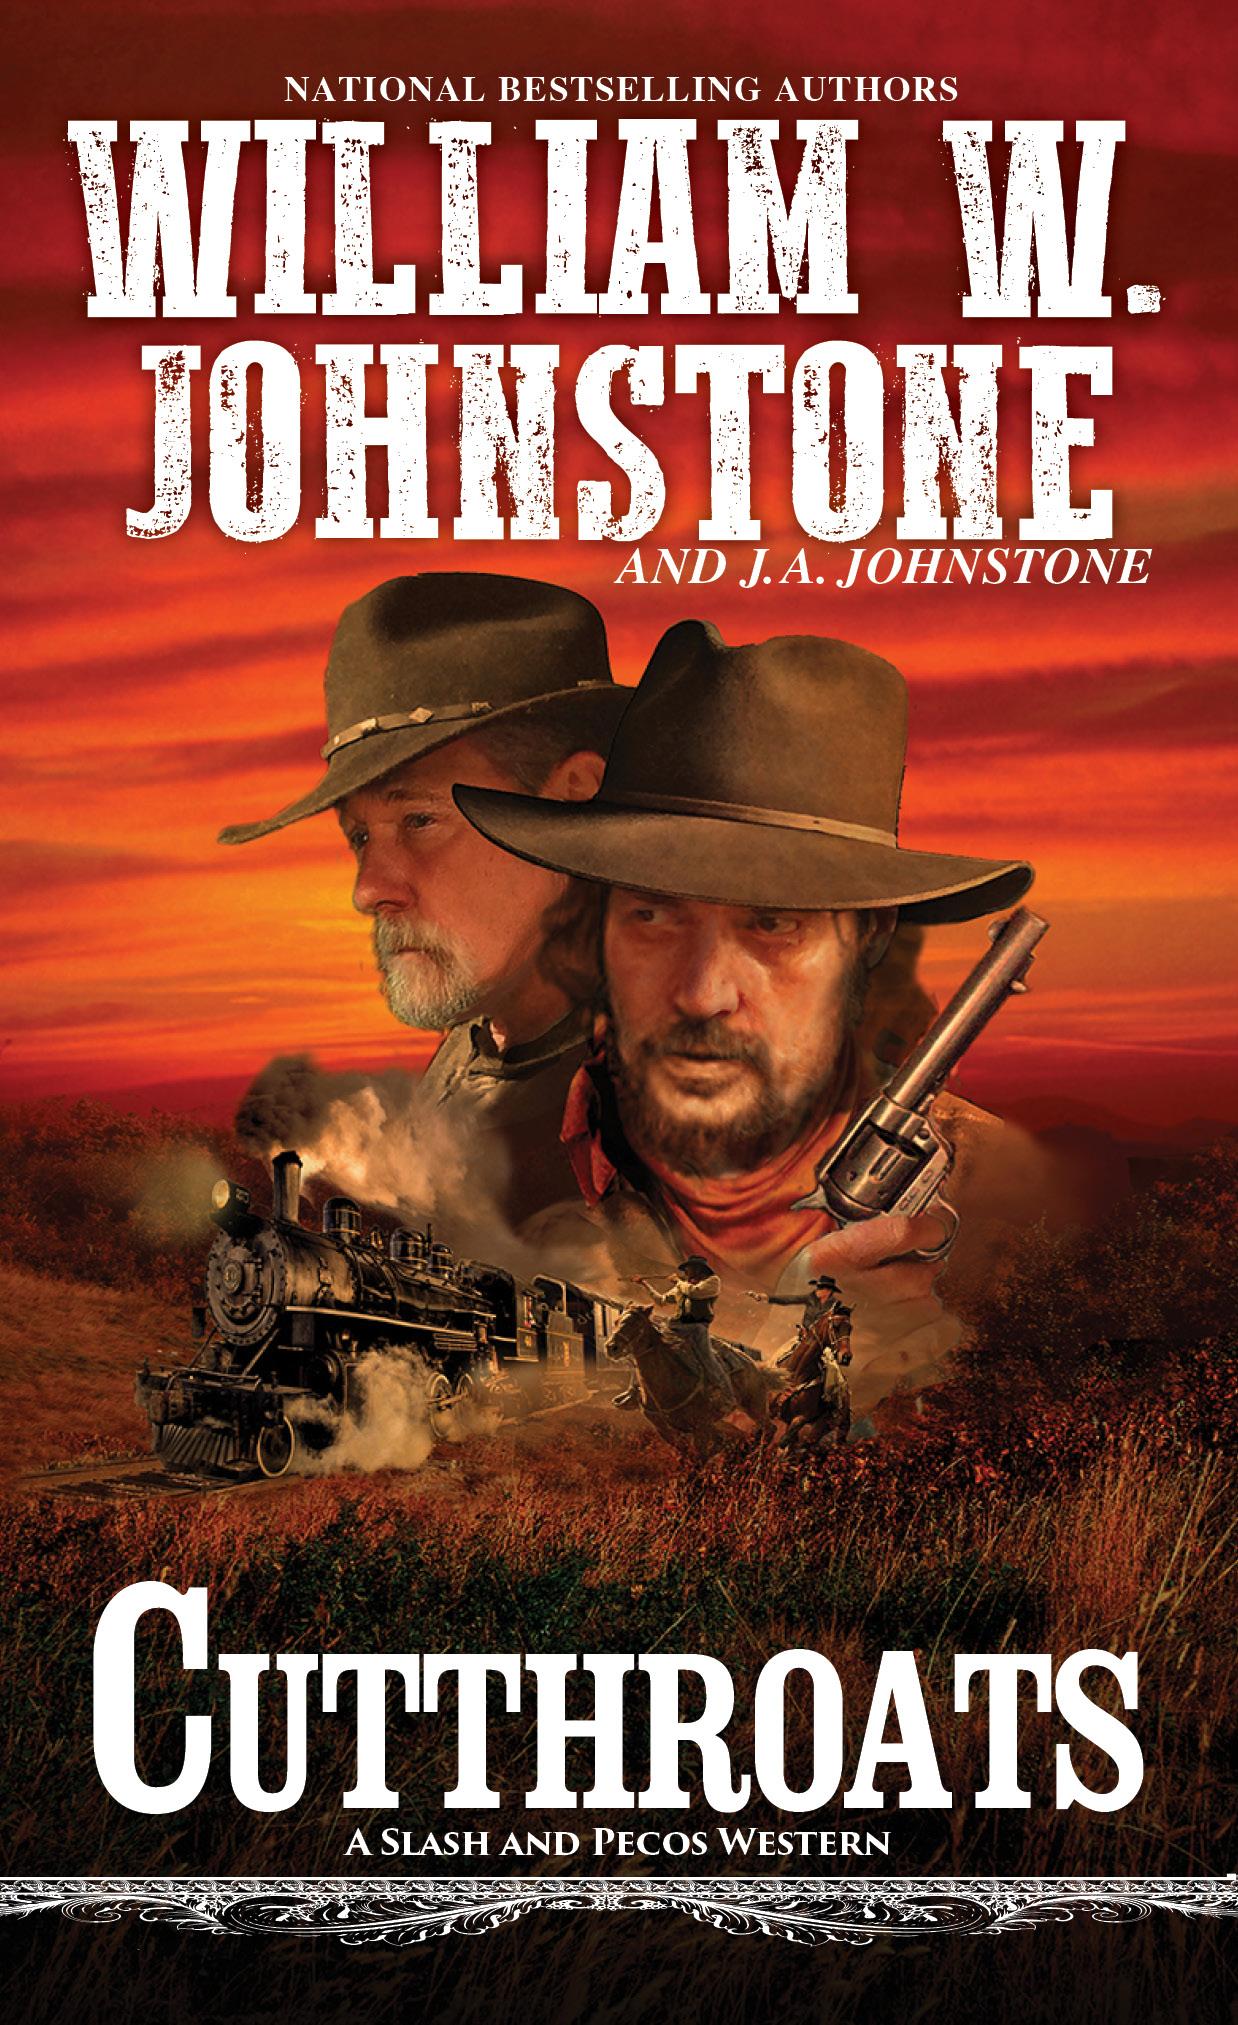 CUTTHROATS by William W. Johnstone & J.A. Johnstone